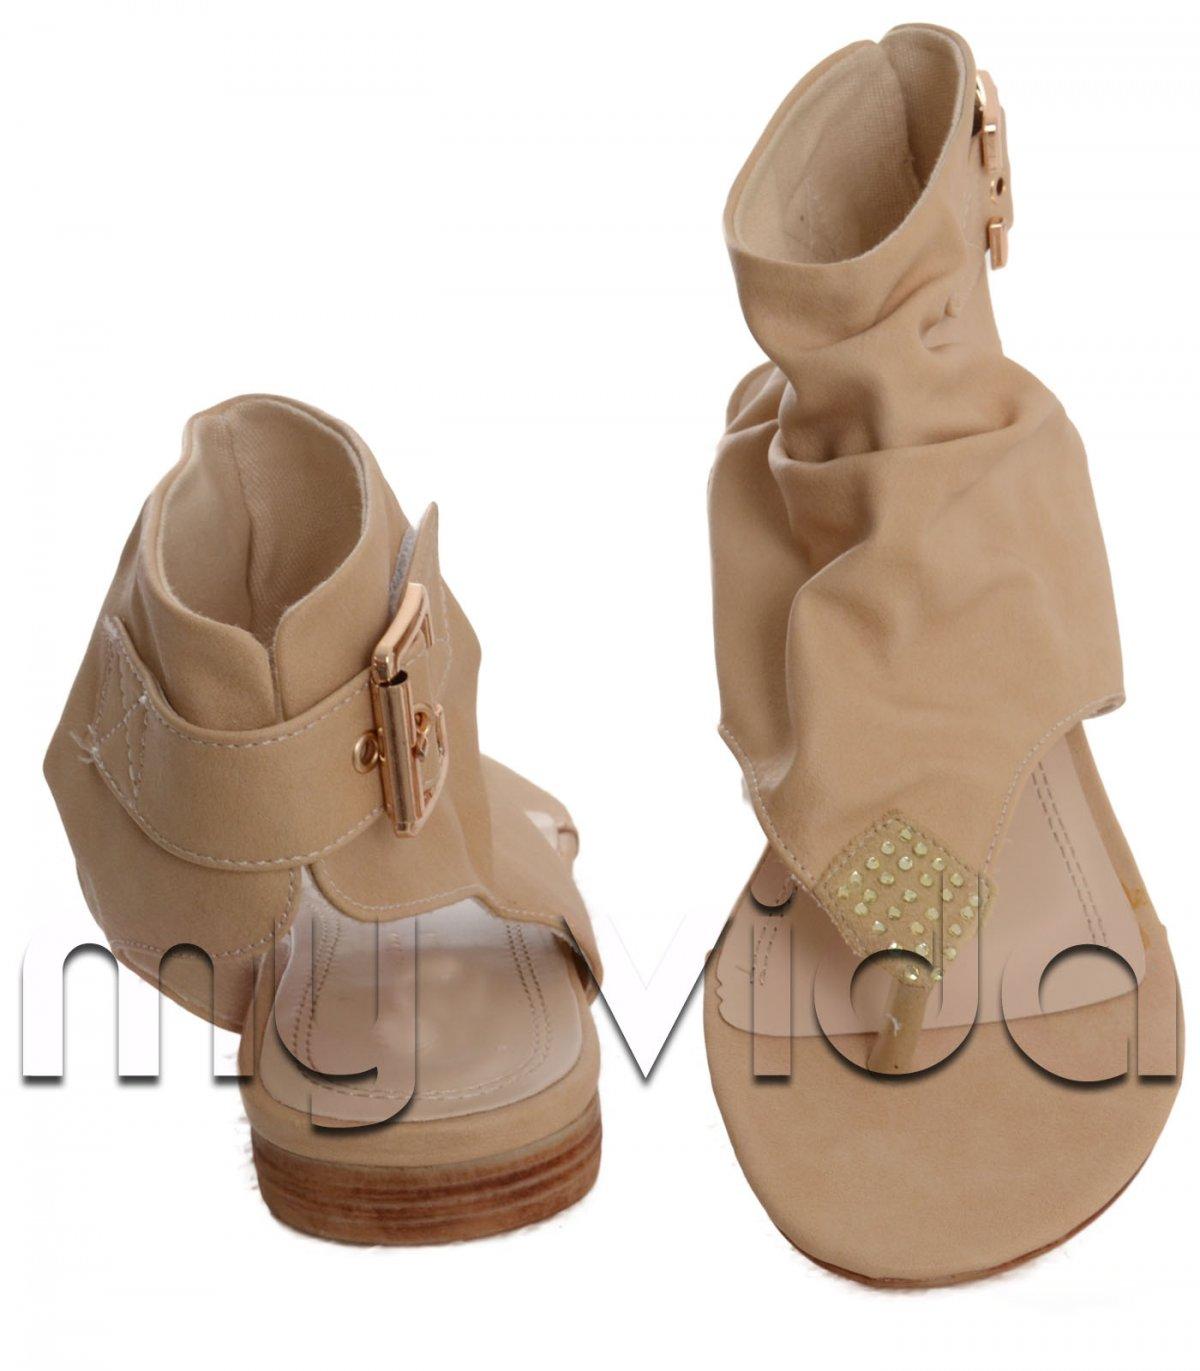 Vida Sandalo Sandalo Donna GladiatoreMy Infradito Infradito Donna Sandalo Infradito GladiatoreMy Vida MpGqzVSU